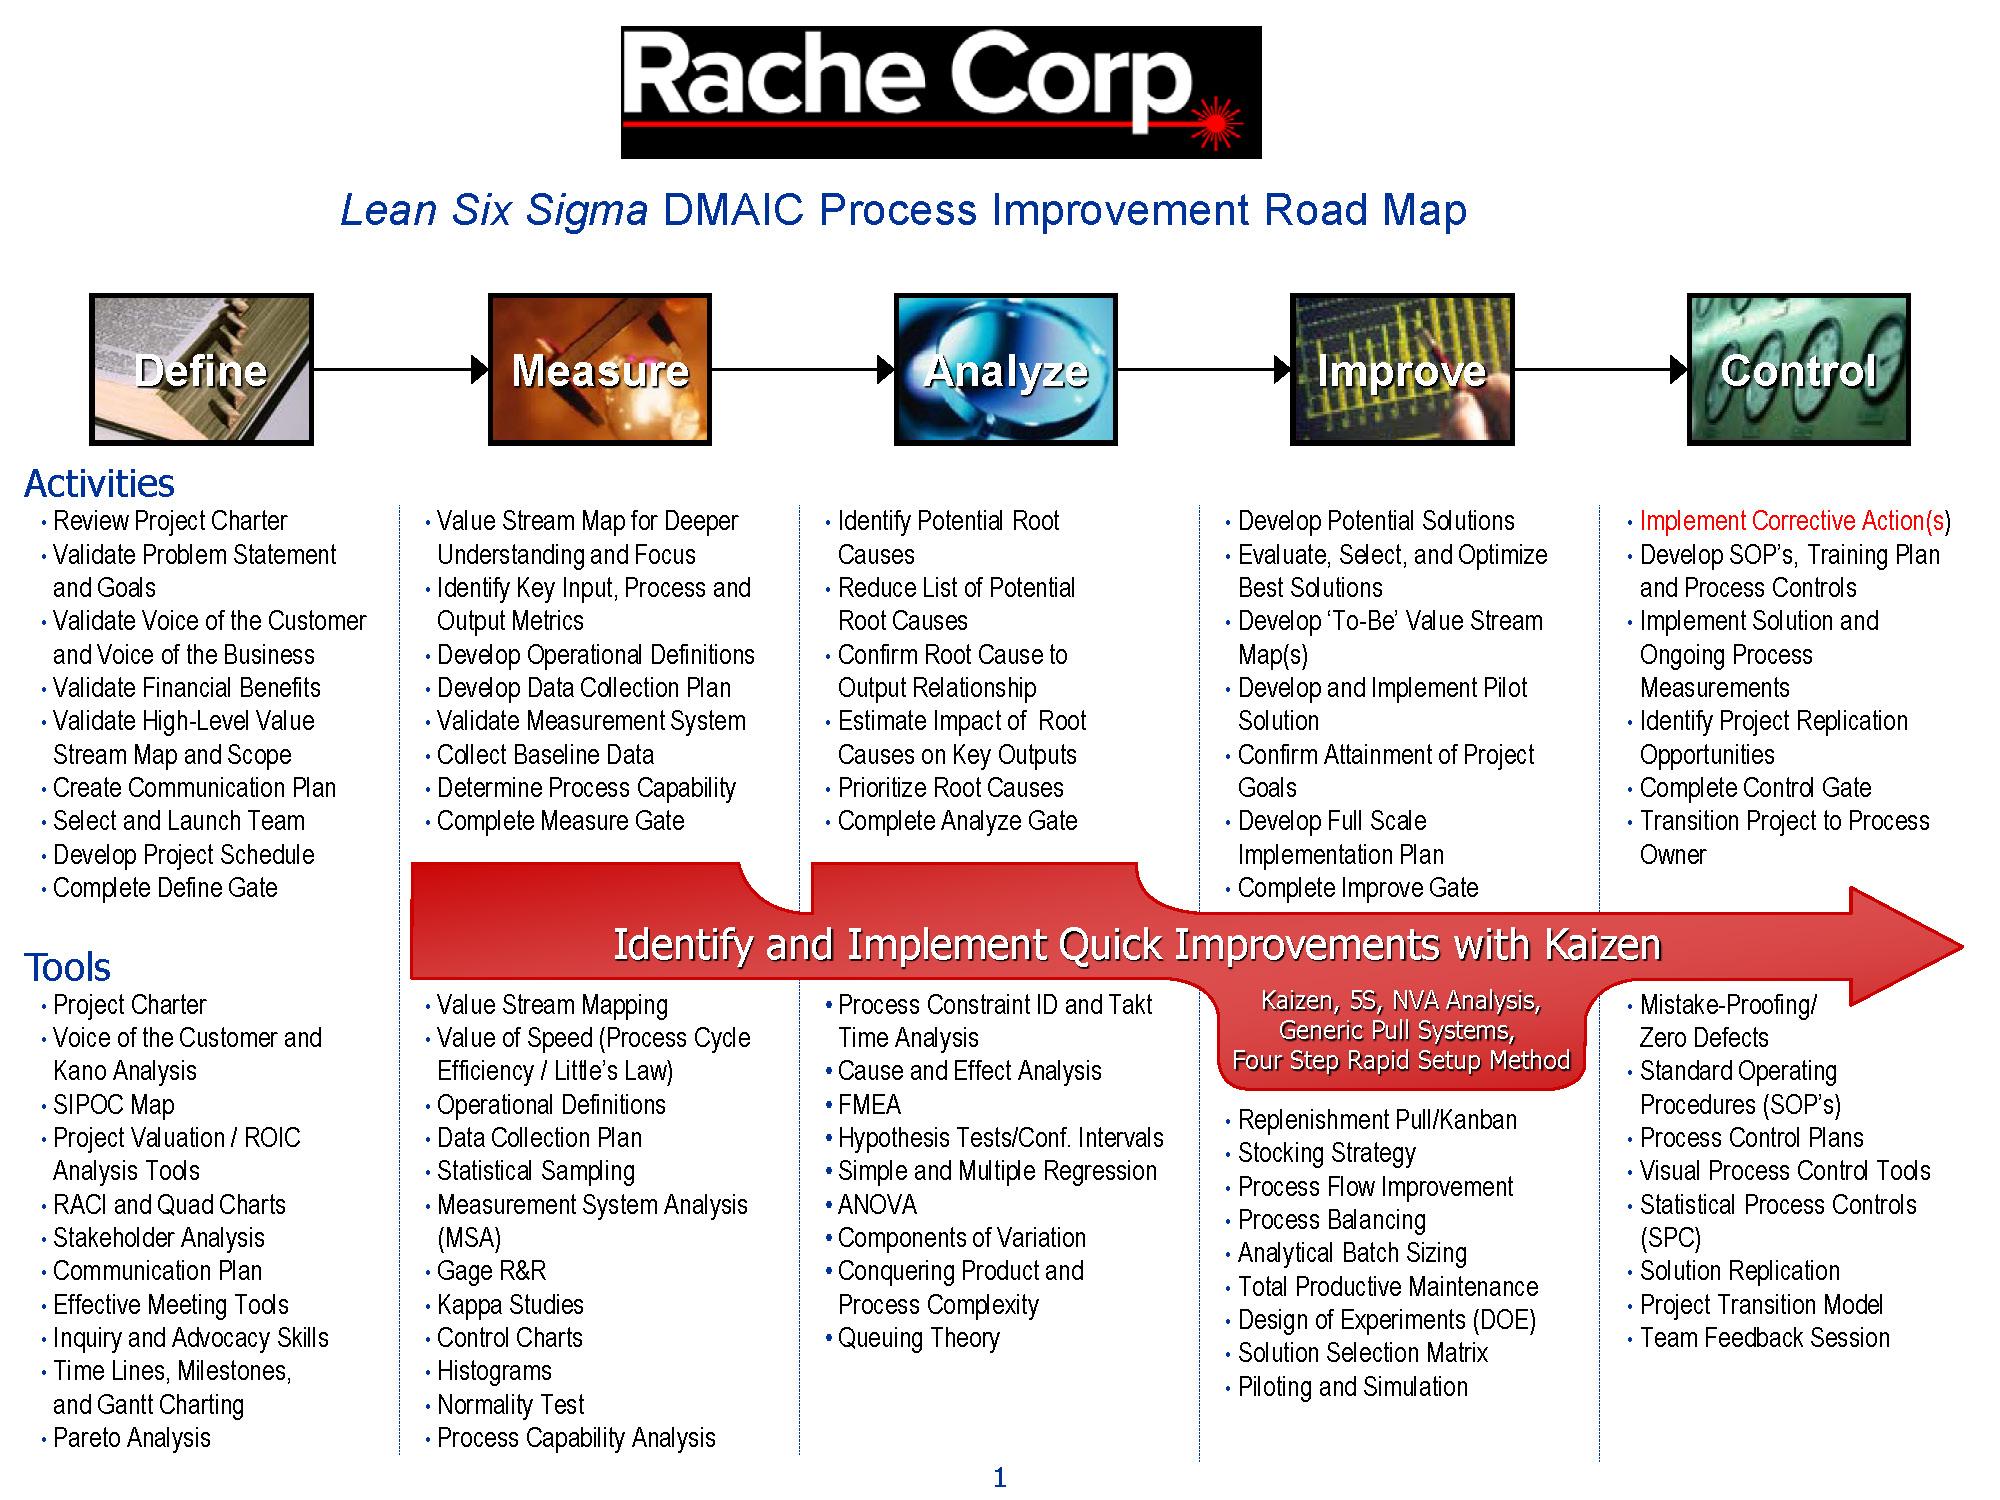 QUALITY \u2014 Rache Corporation